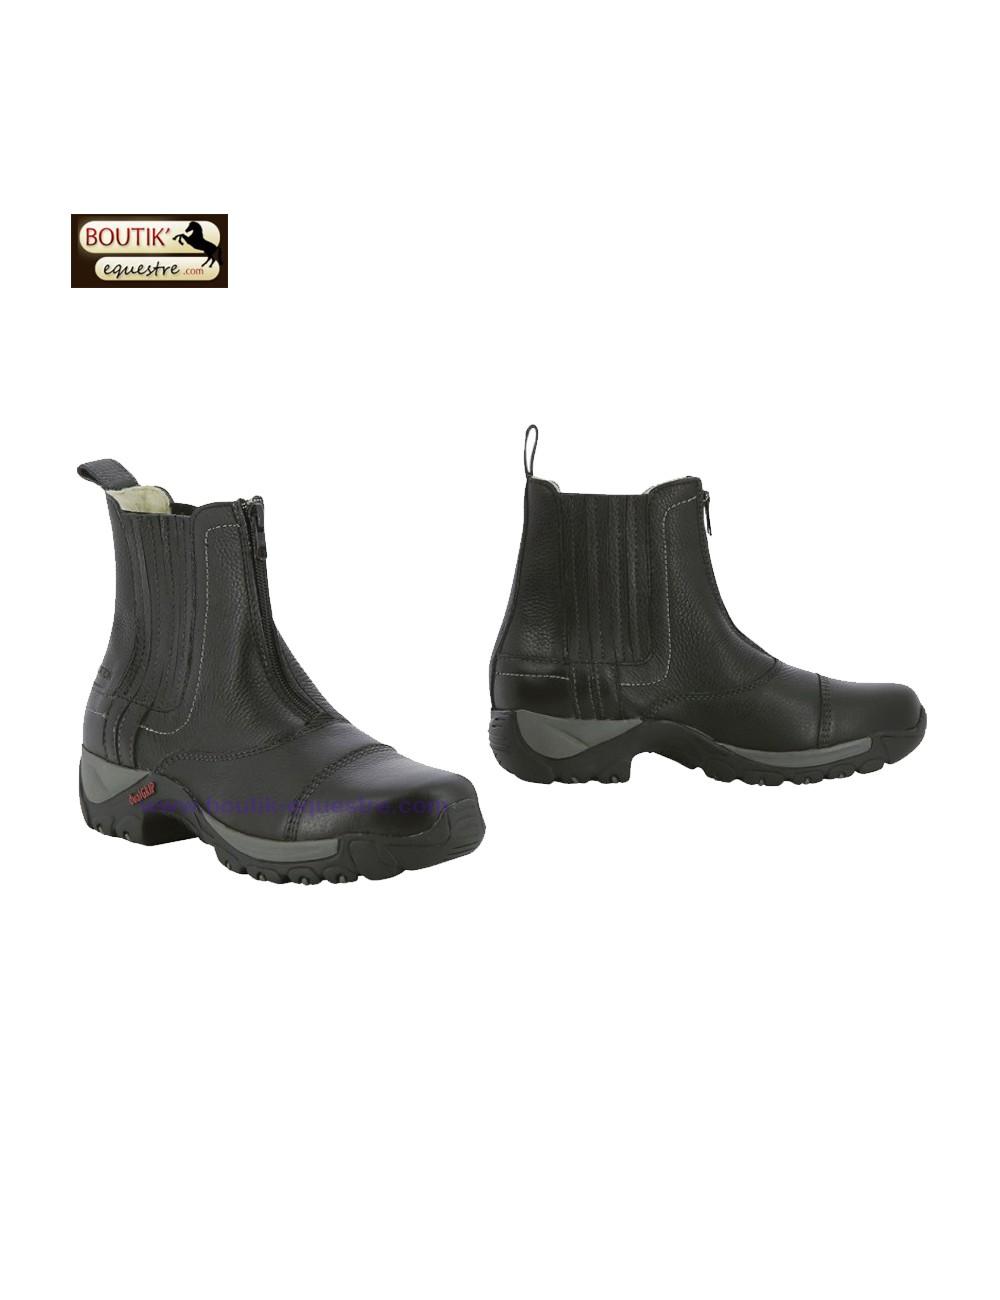 Boots NORTON Zermatt hiver